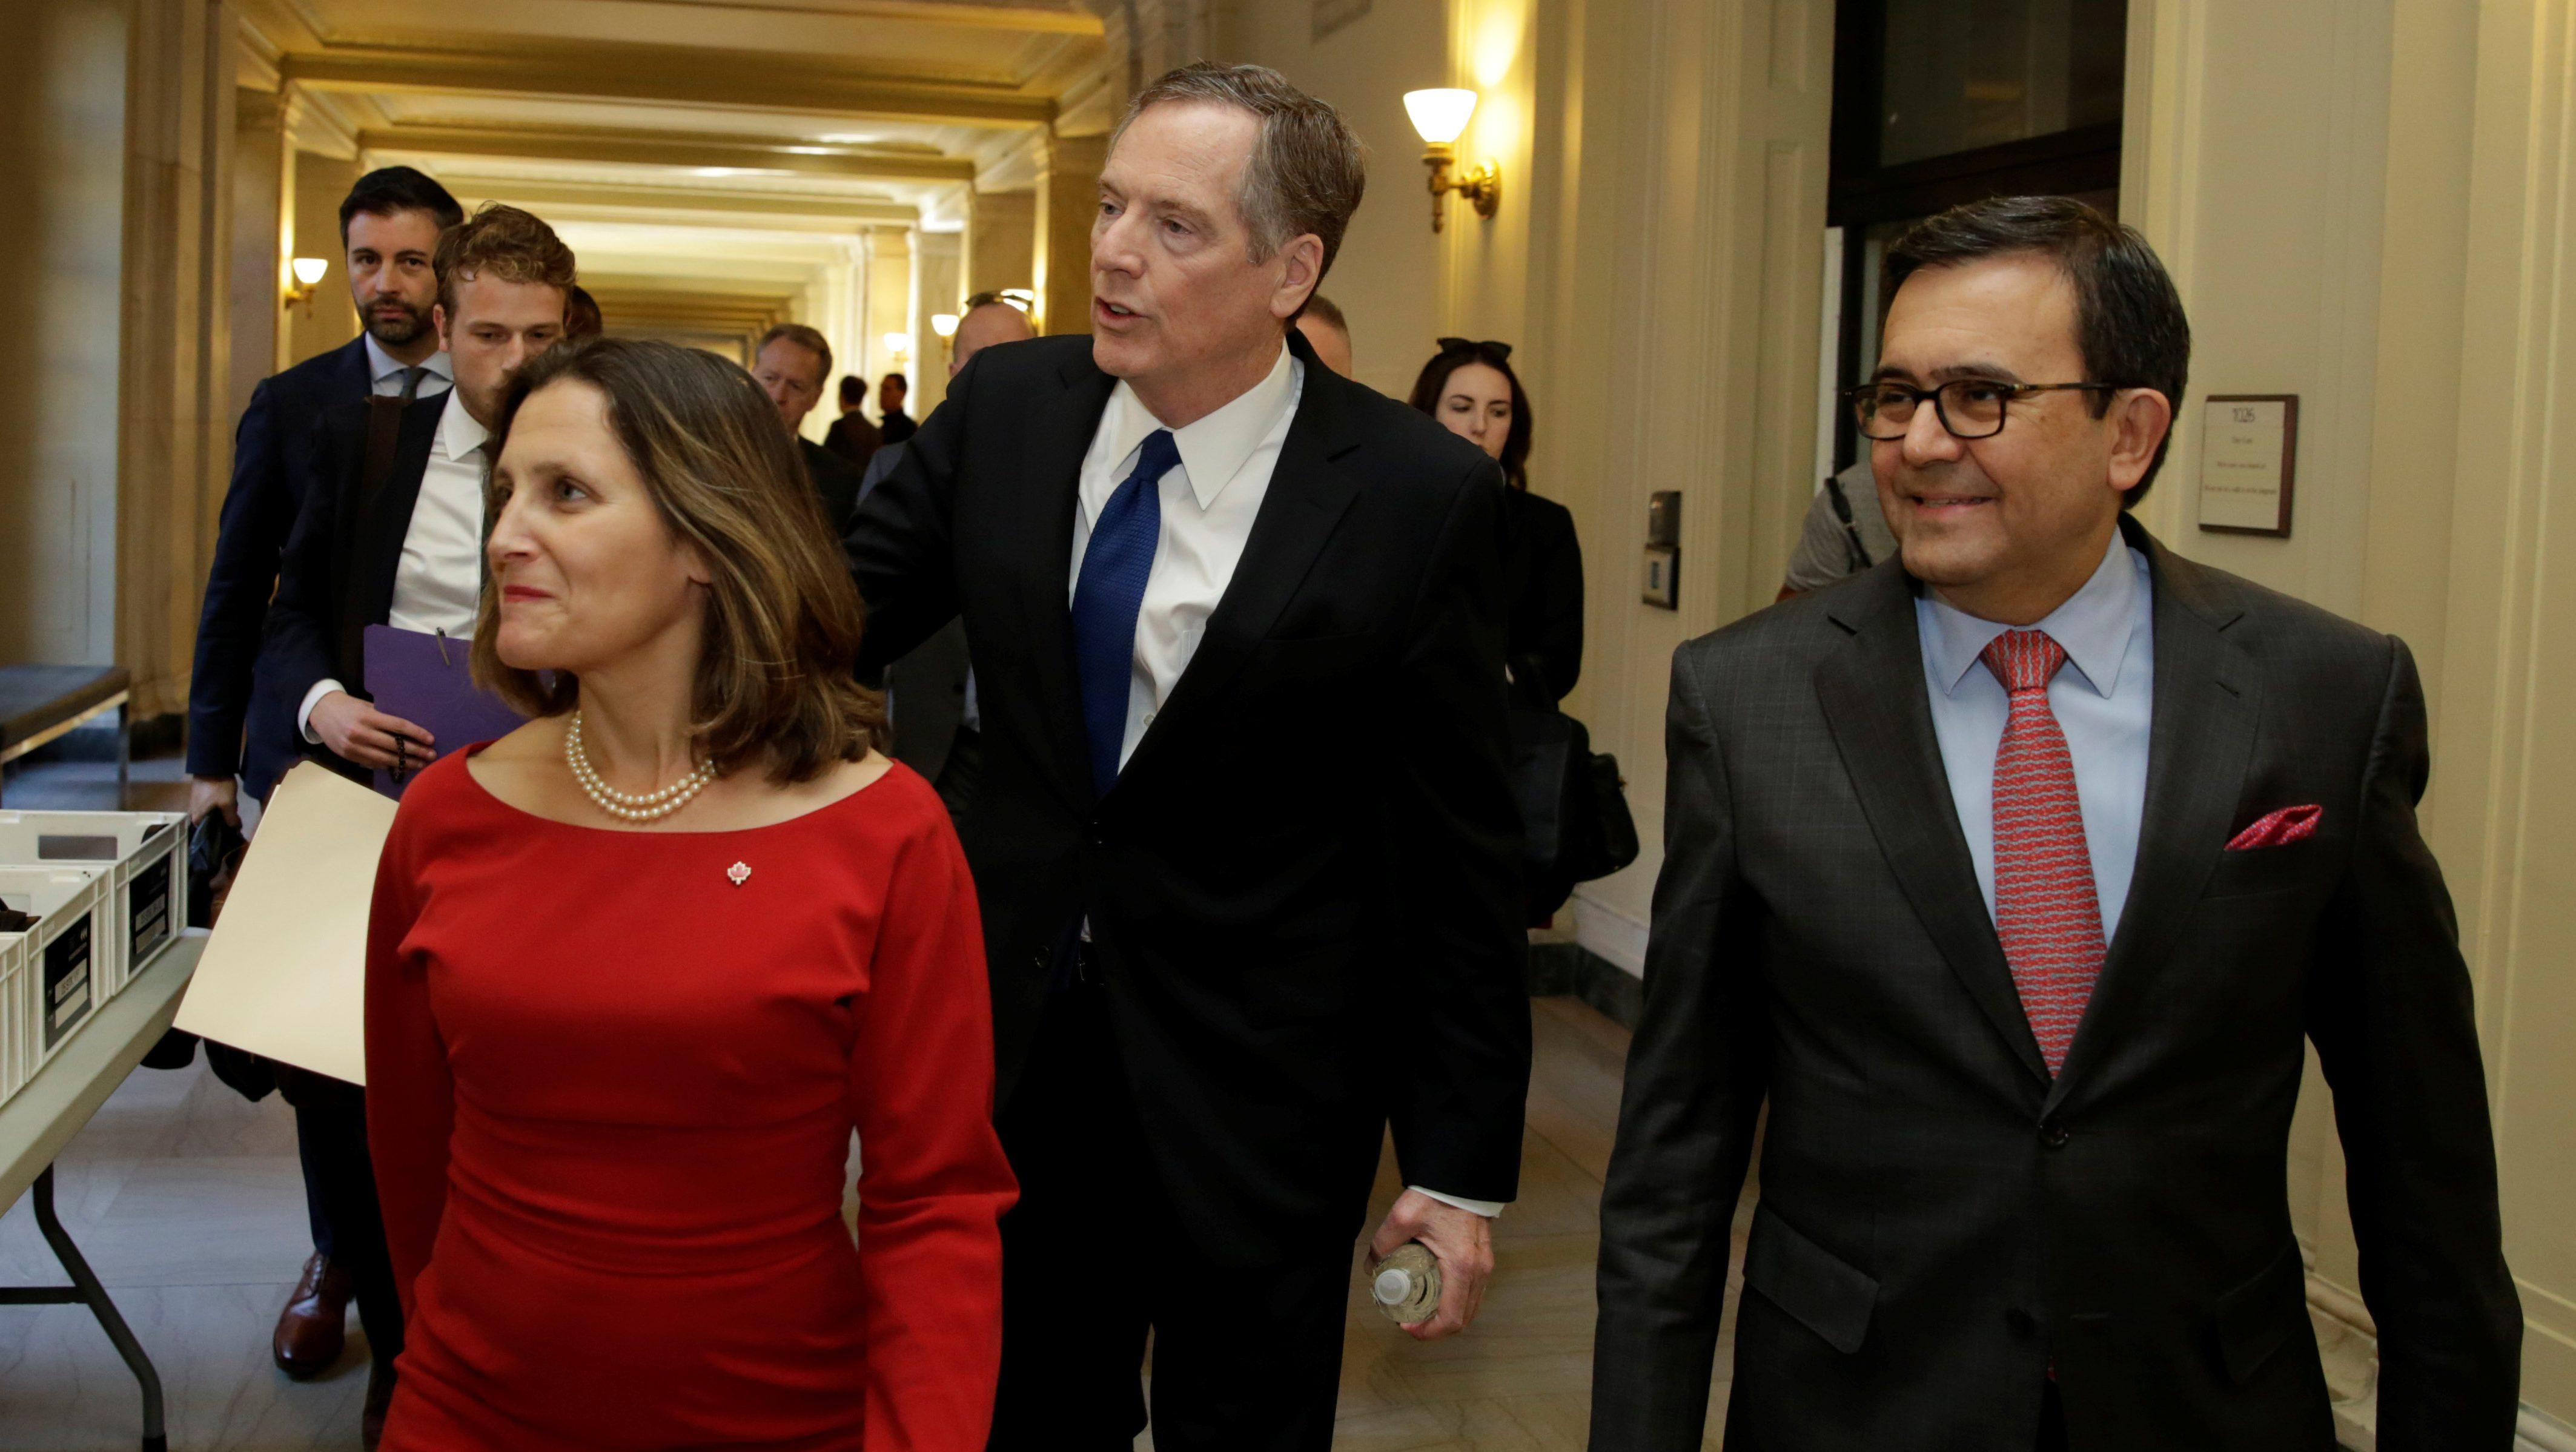 Canadian Foreign Affairs Minister Chrystia Freeland, U.S. Trade Rep Robert Lighthizer and Mexican Secretary of Economy Ildefonso Guajardo Villarreal nafta talks